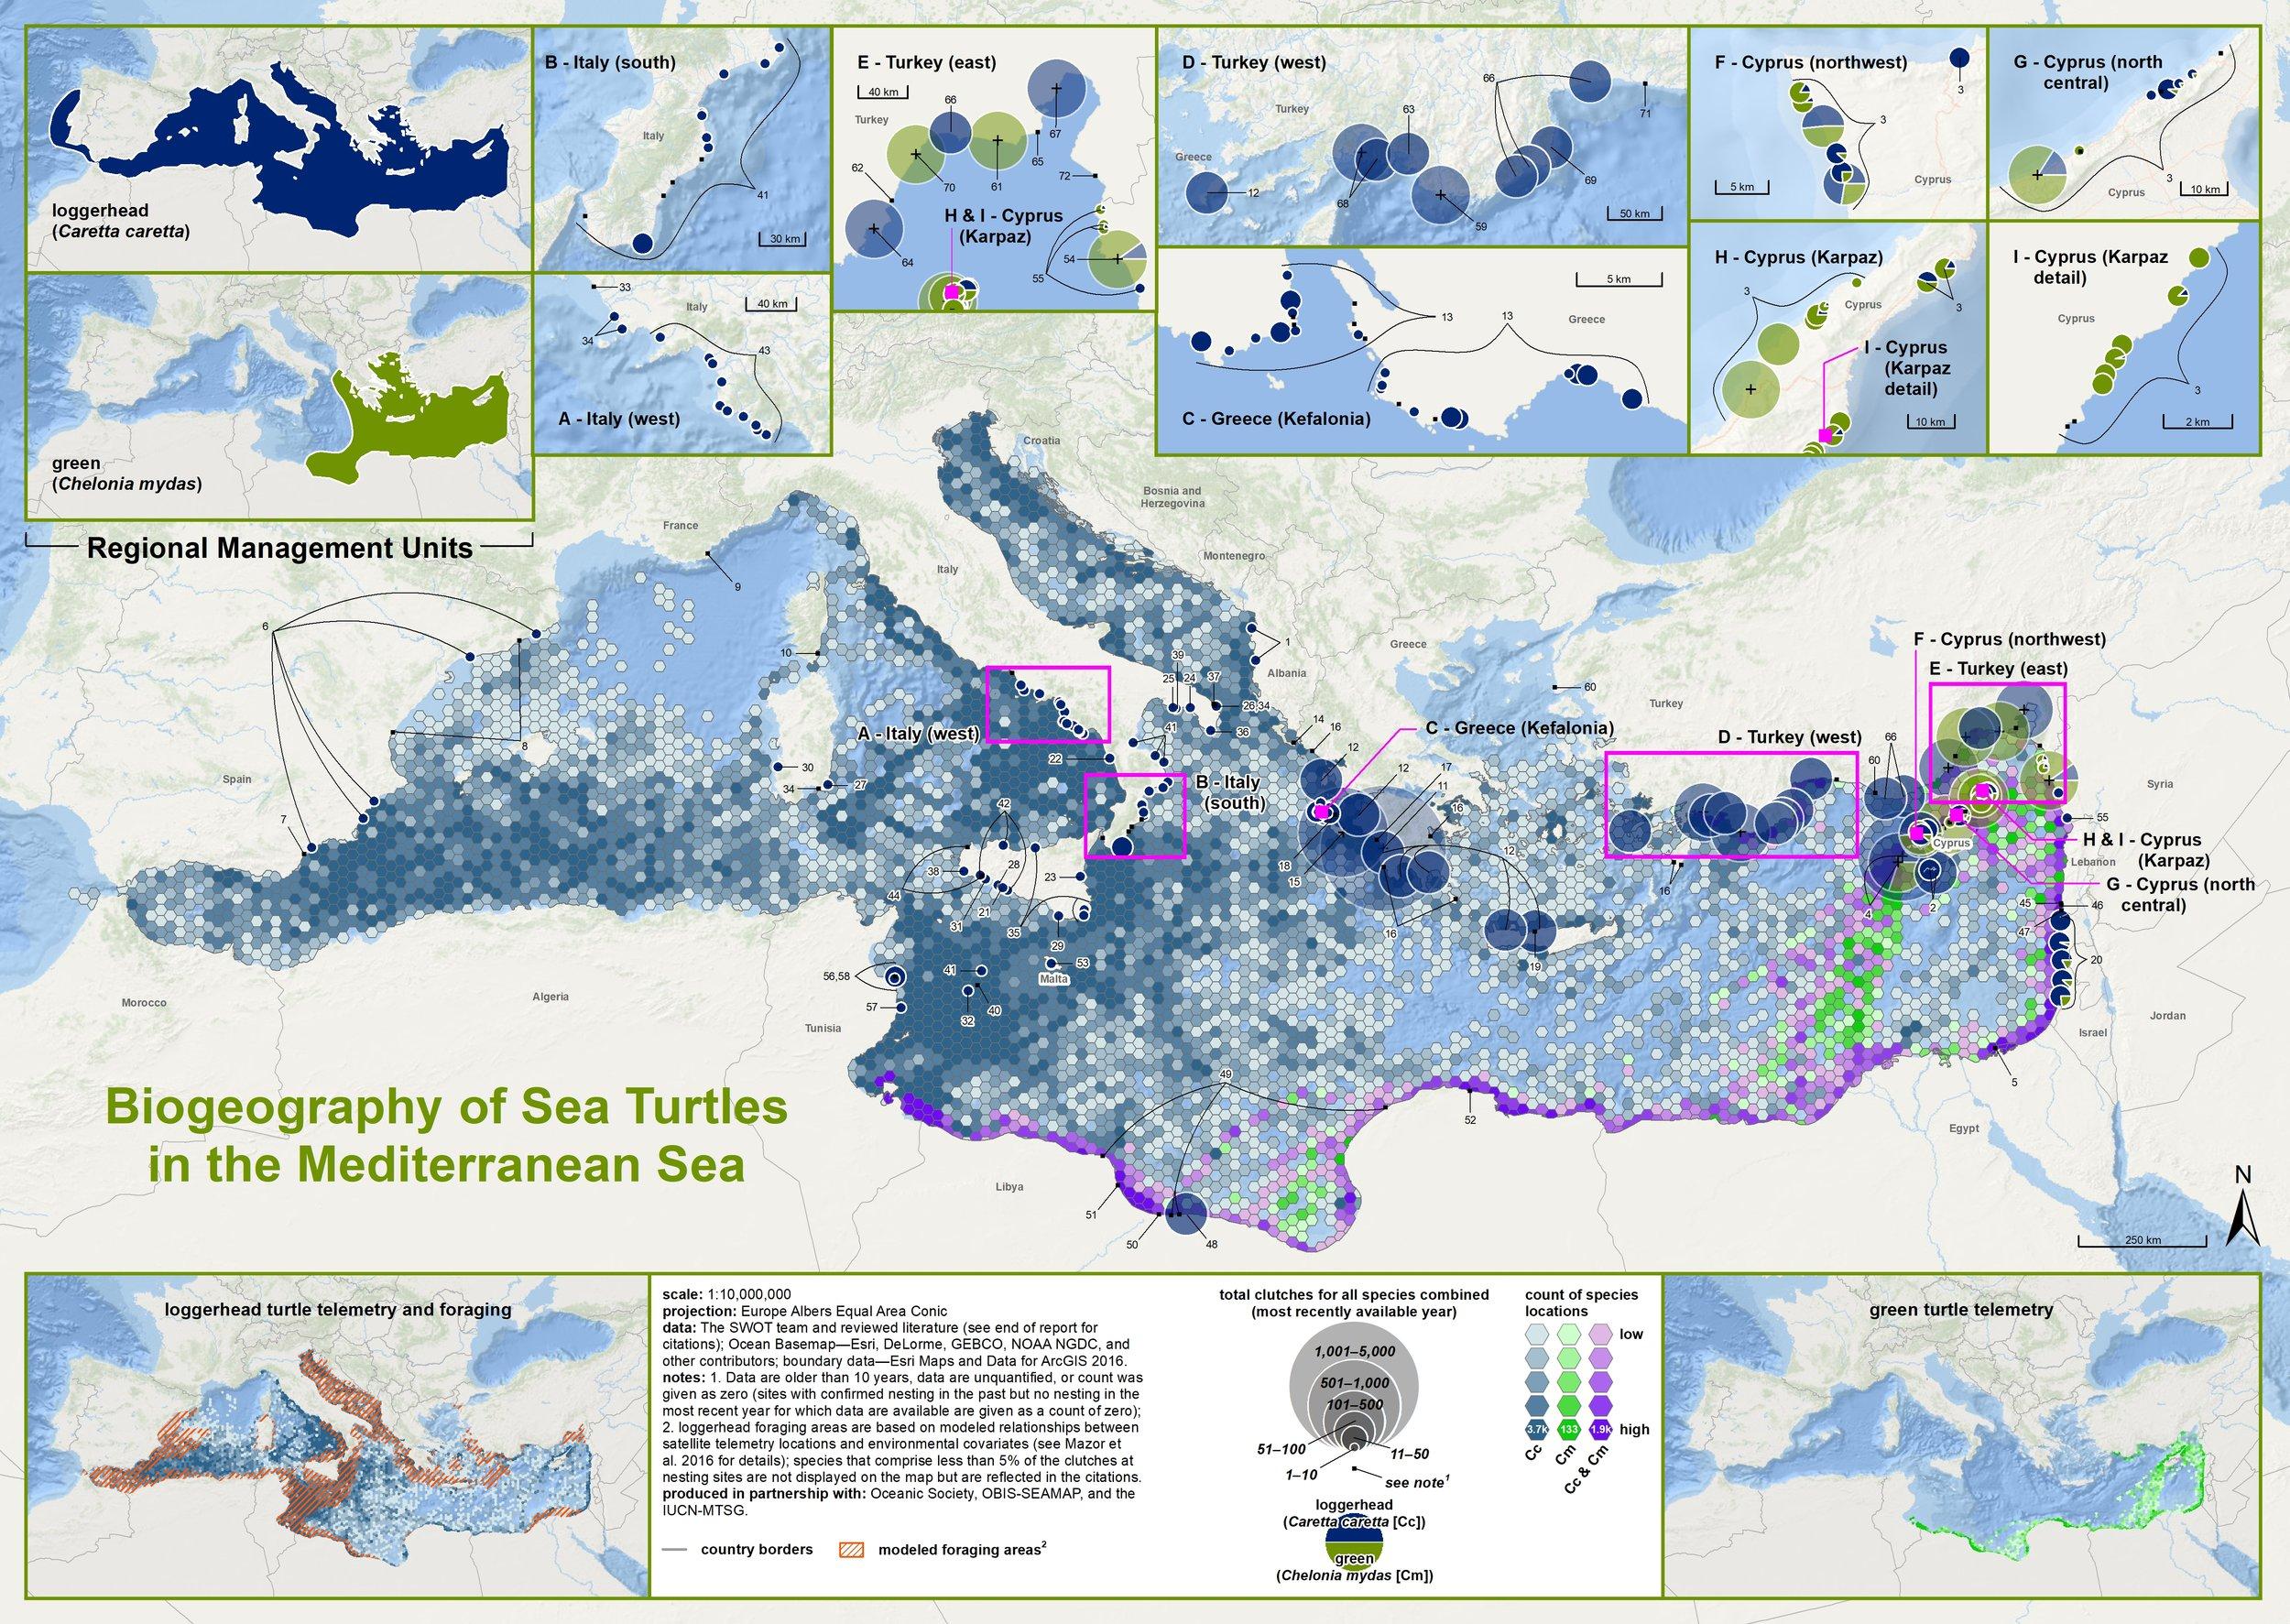 Biogeography of Sea Turtles in the Mediterranean Sea ( data citations ) |   SWOT Report   , vol. XIV (2019) .